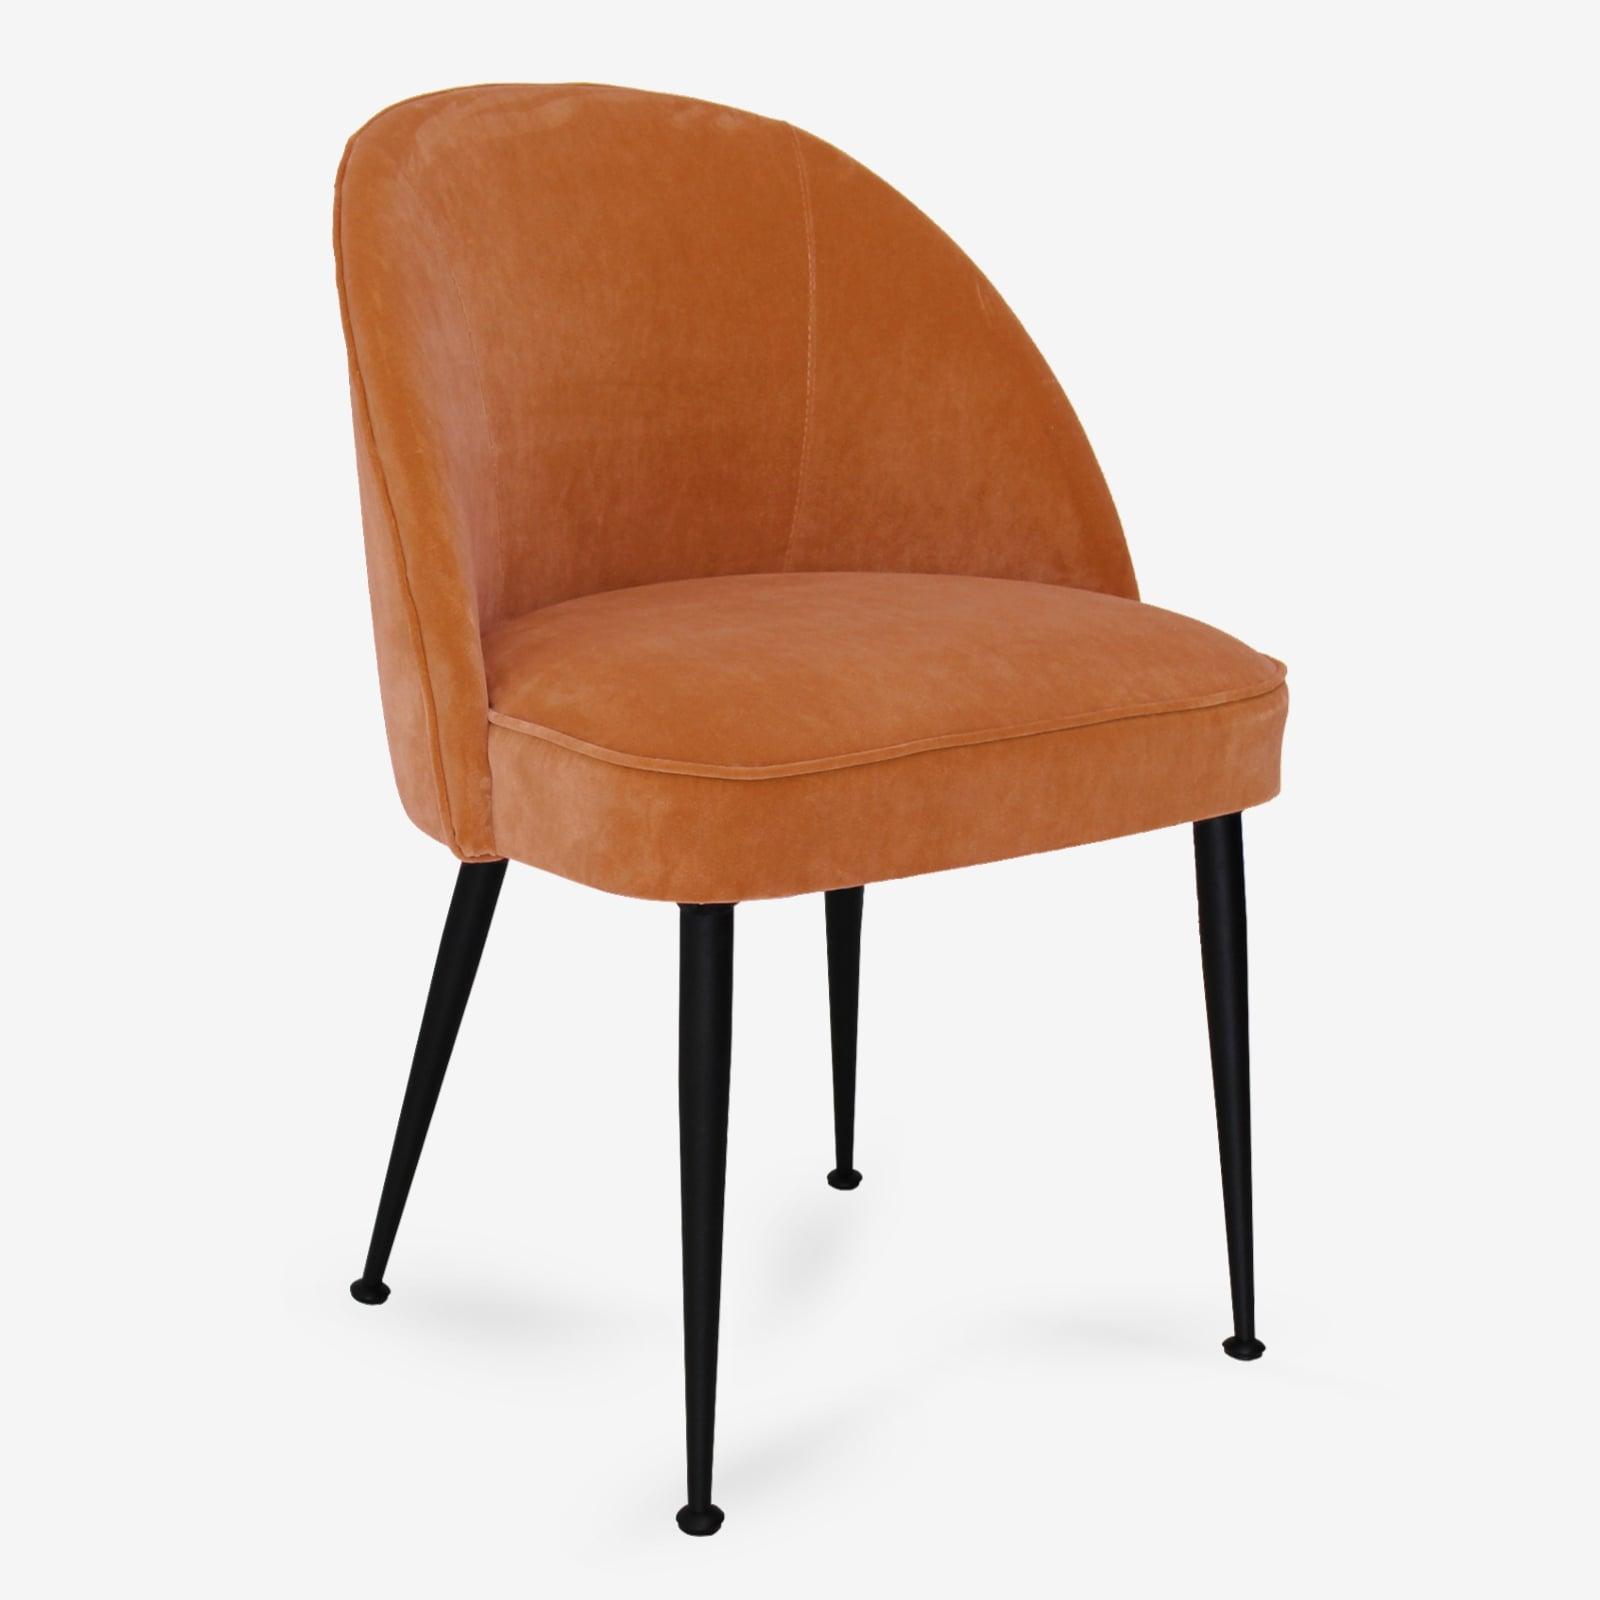 Sedia moderna imbottita in Velluto arancio con gambe in